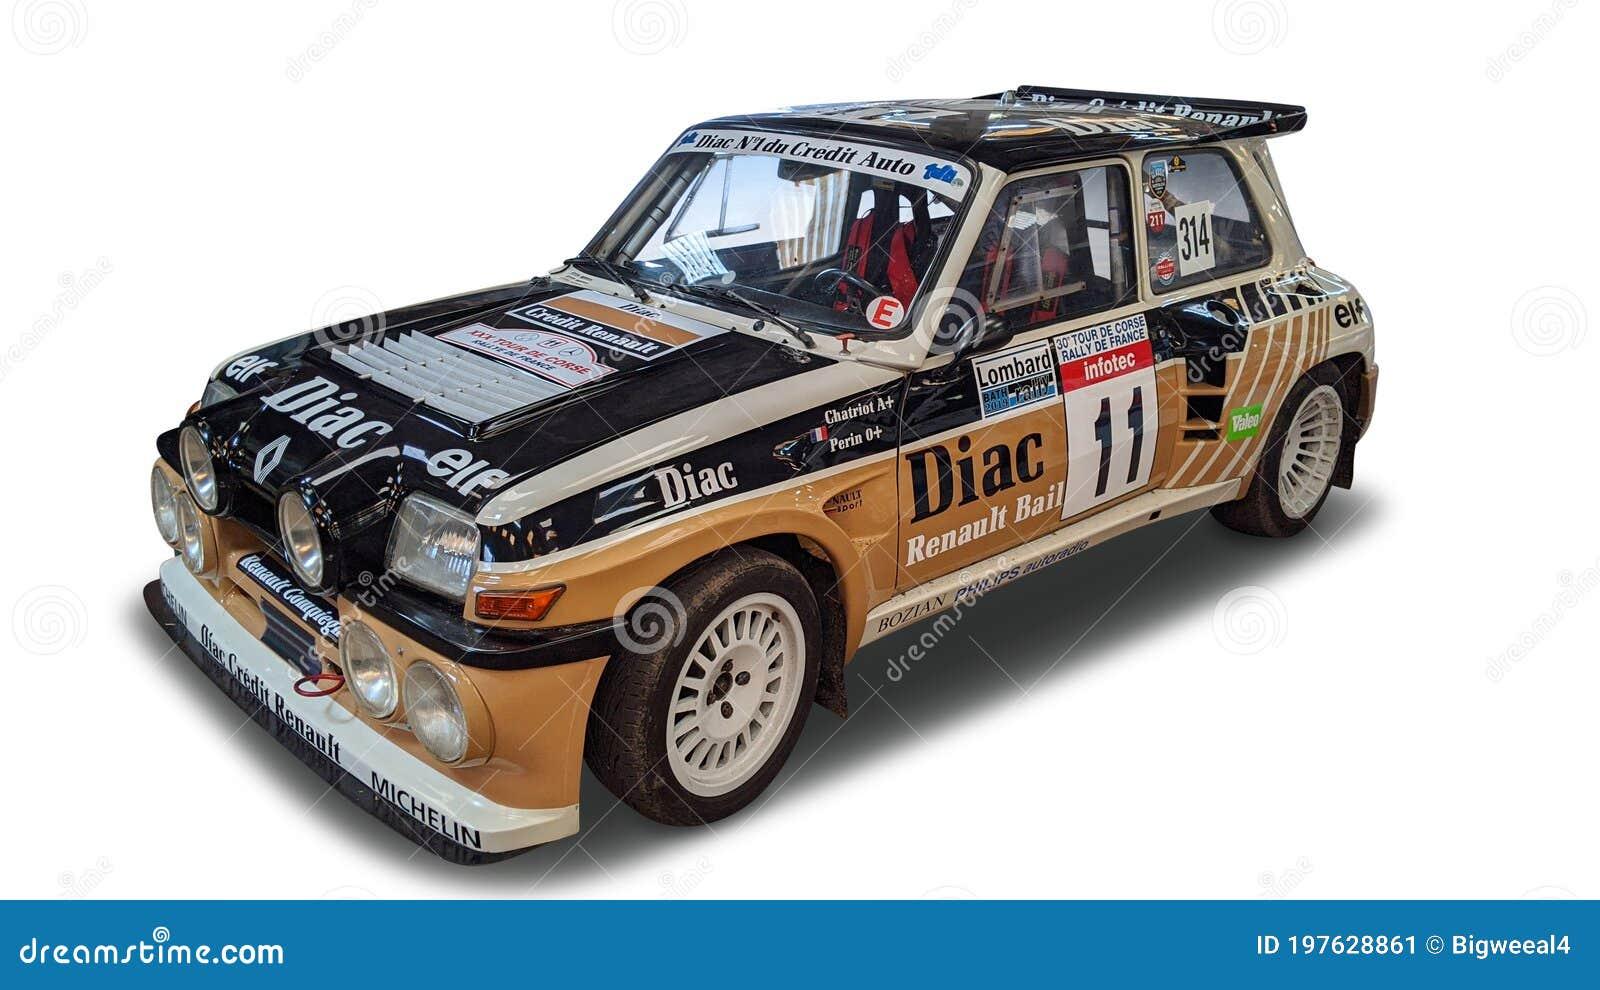 White Background Renault 5 Gt Turbo 2 Editorial Photo Image Of Rear Renailt 197628861